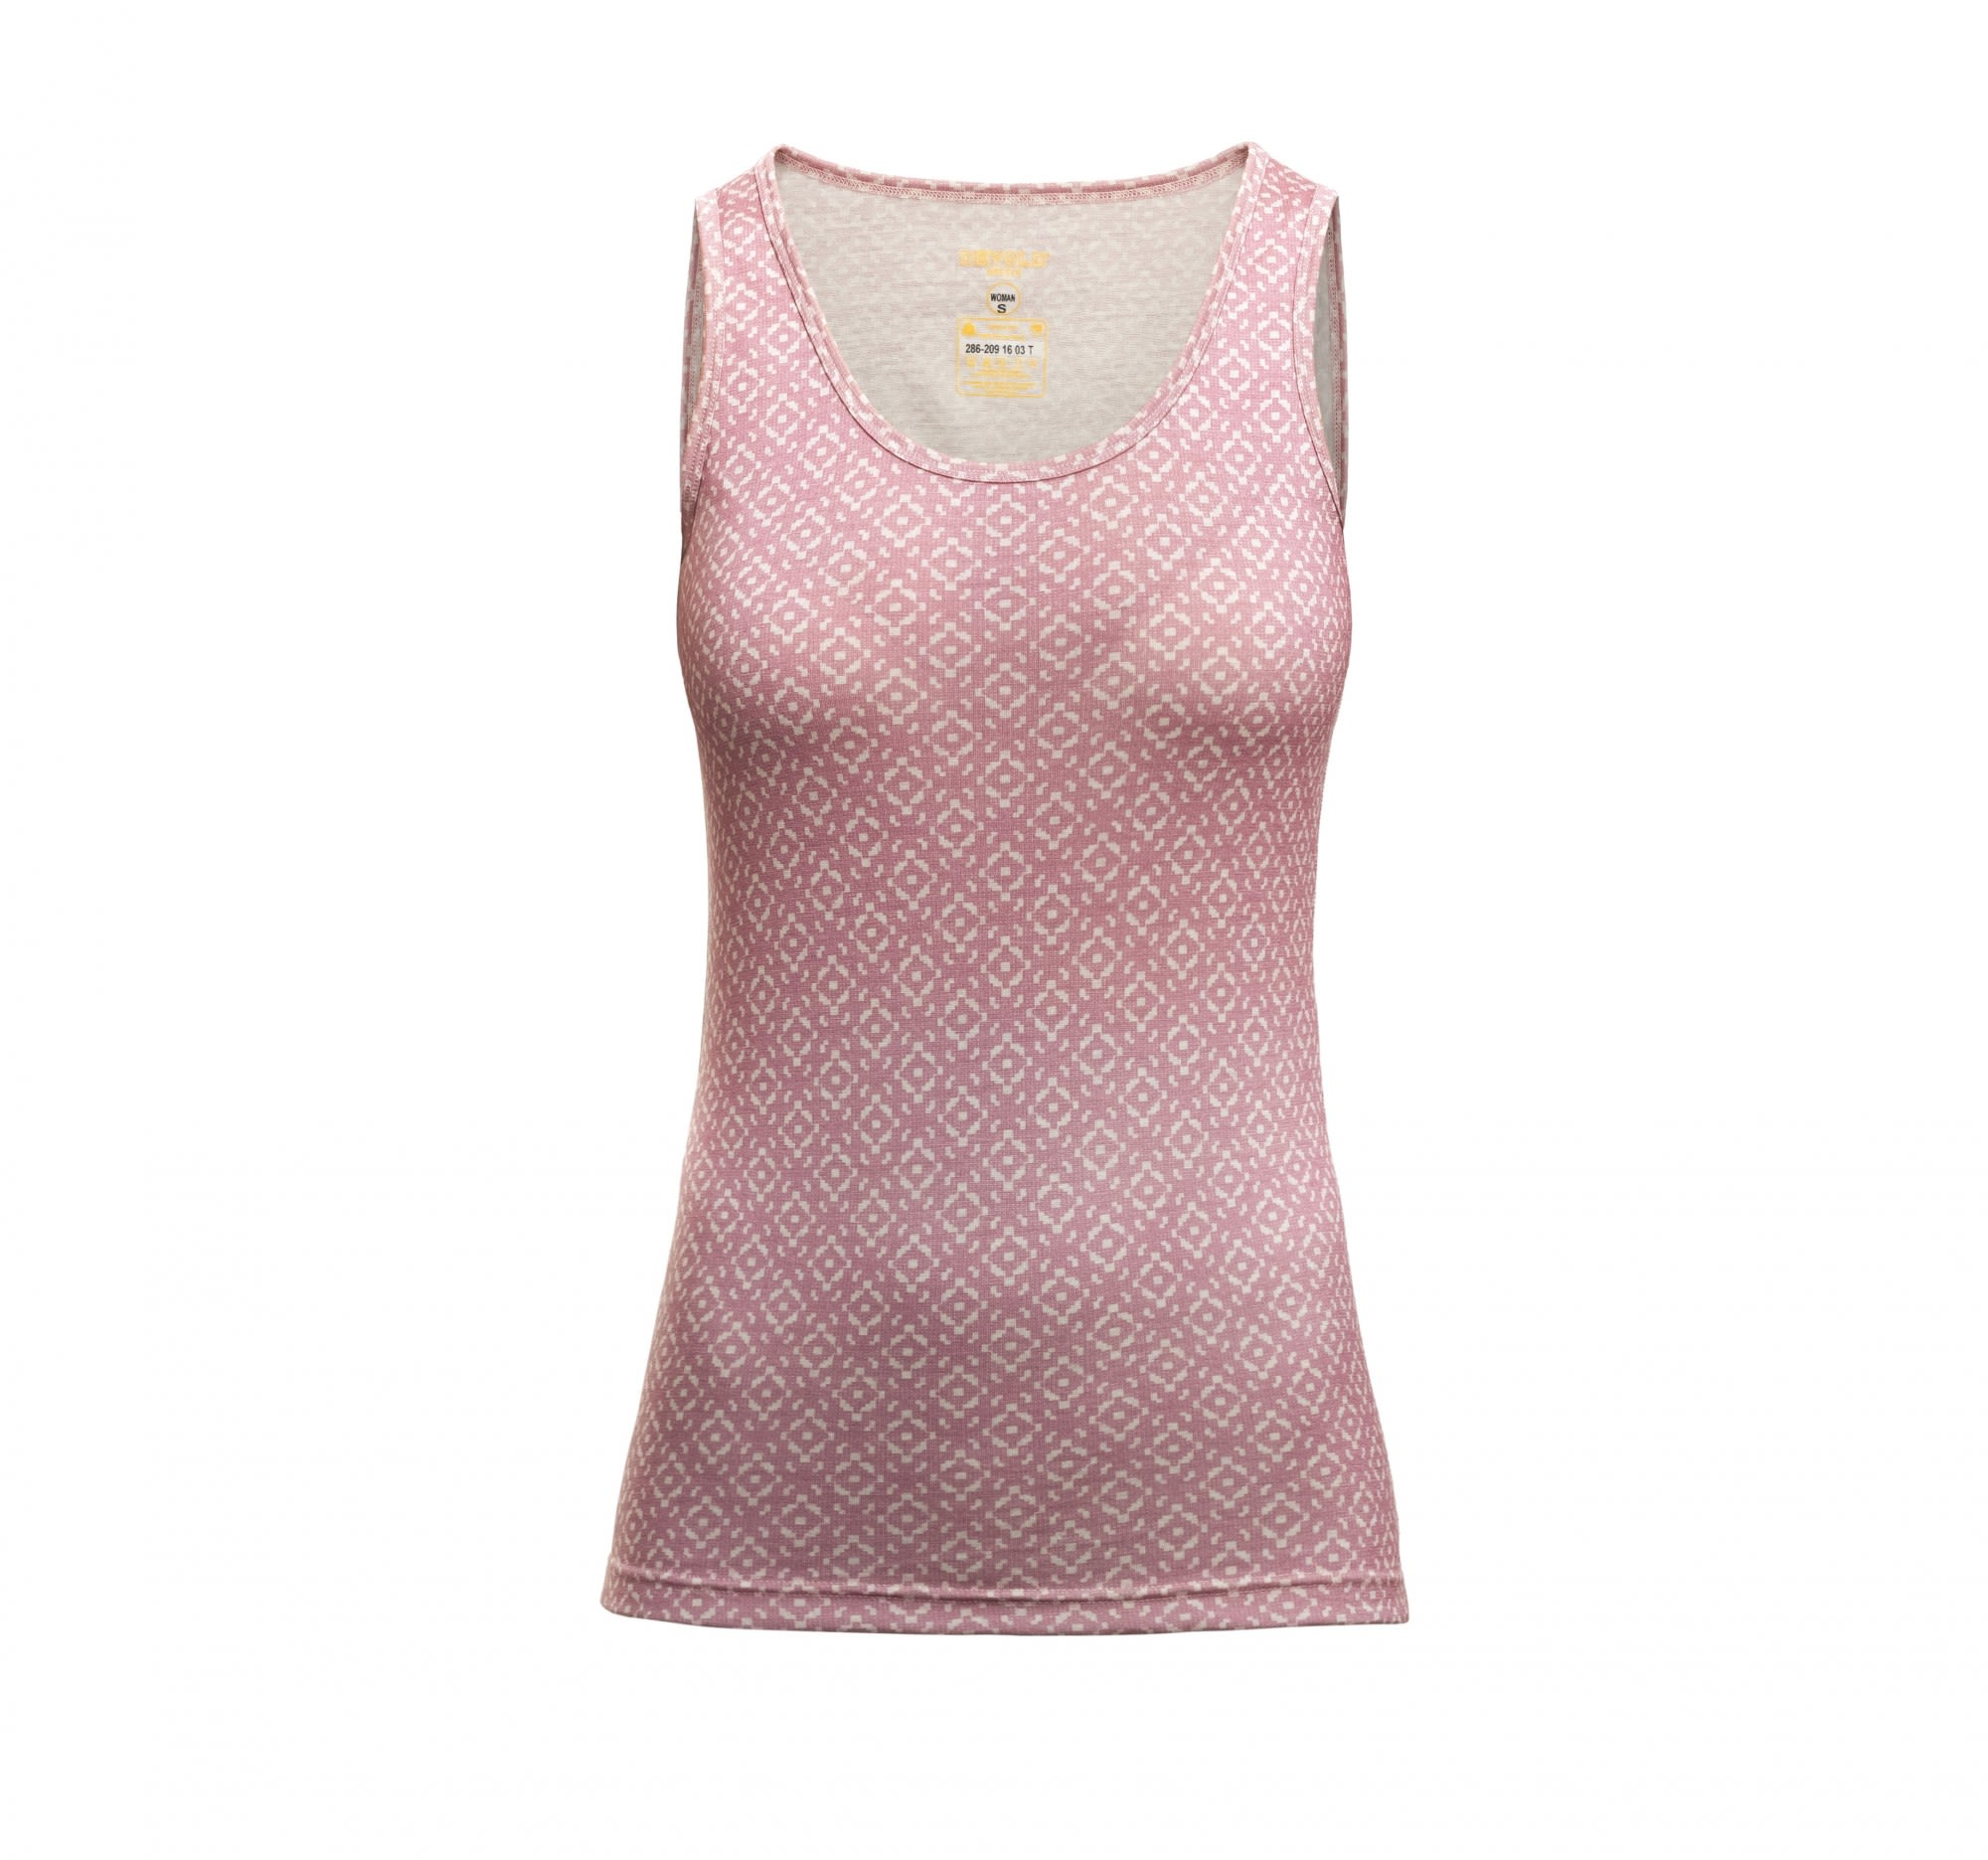 Devold Breeze Woman Singlet Print   Größe S,M,L   Damen Top